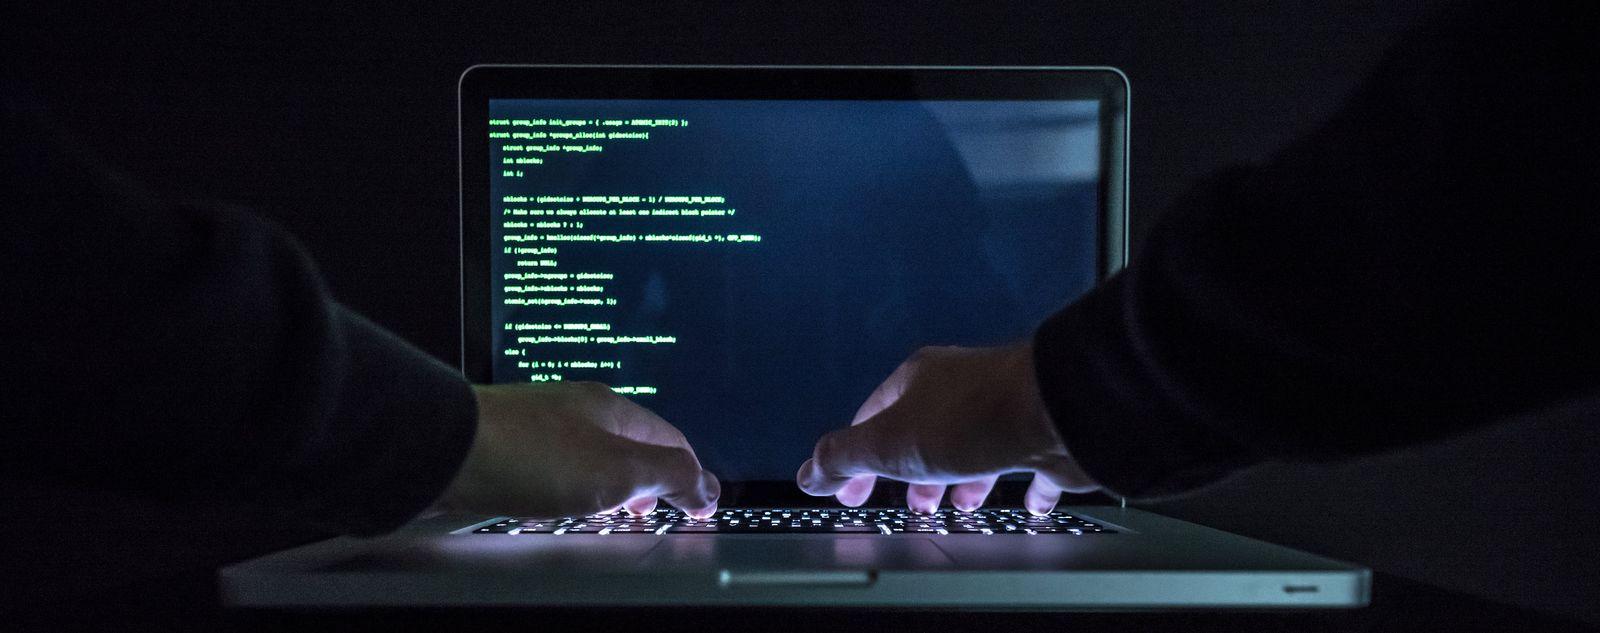 Computer-Hacker Symbolbild